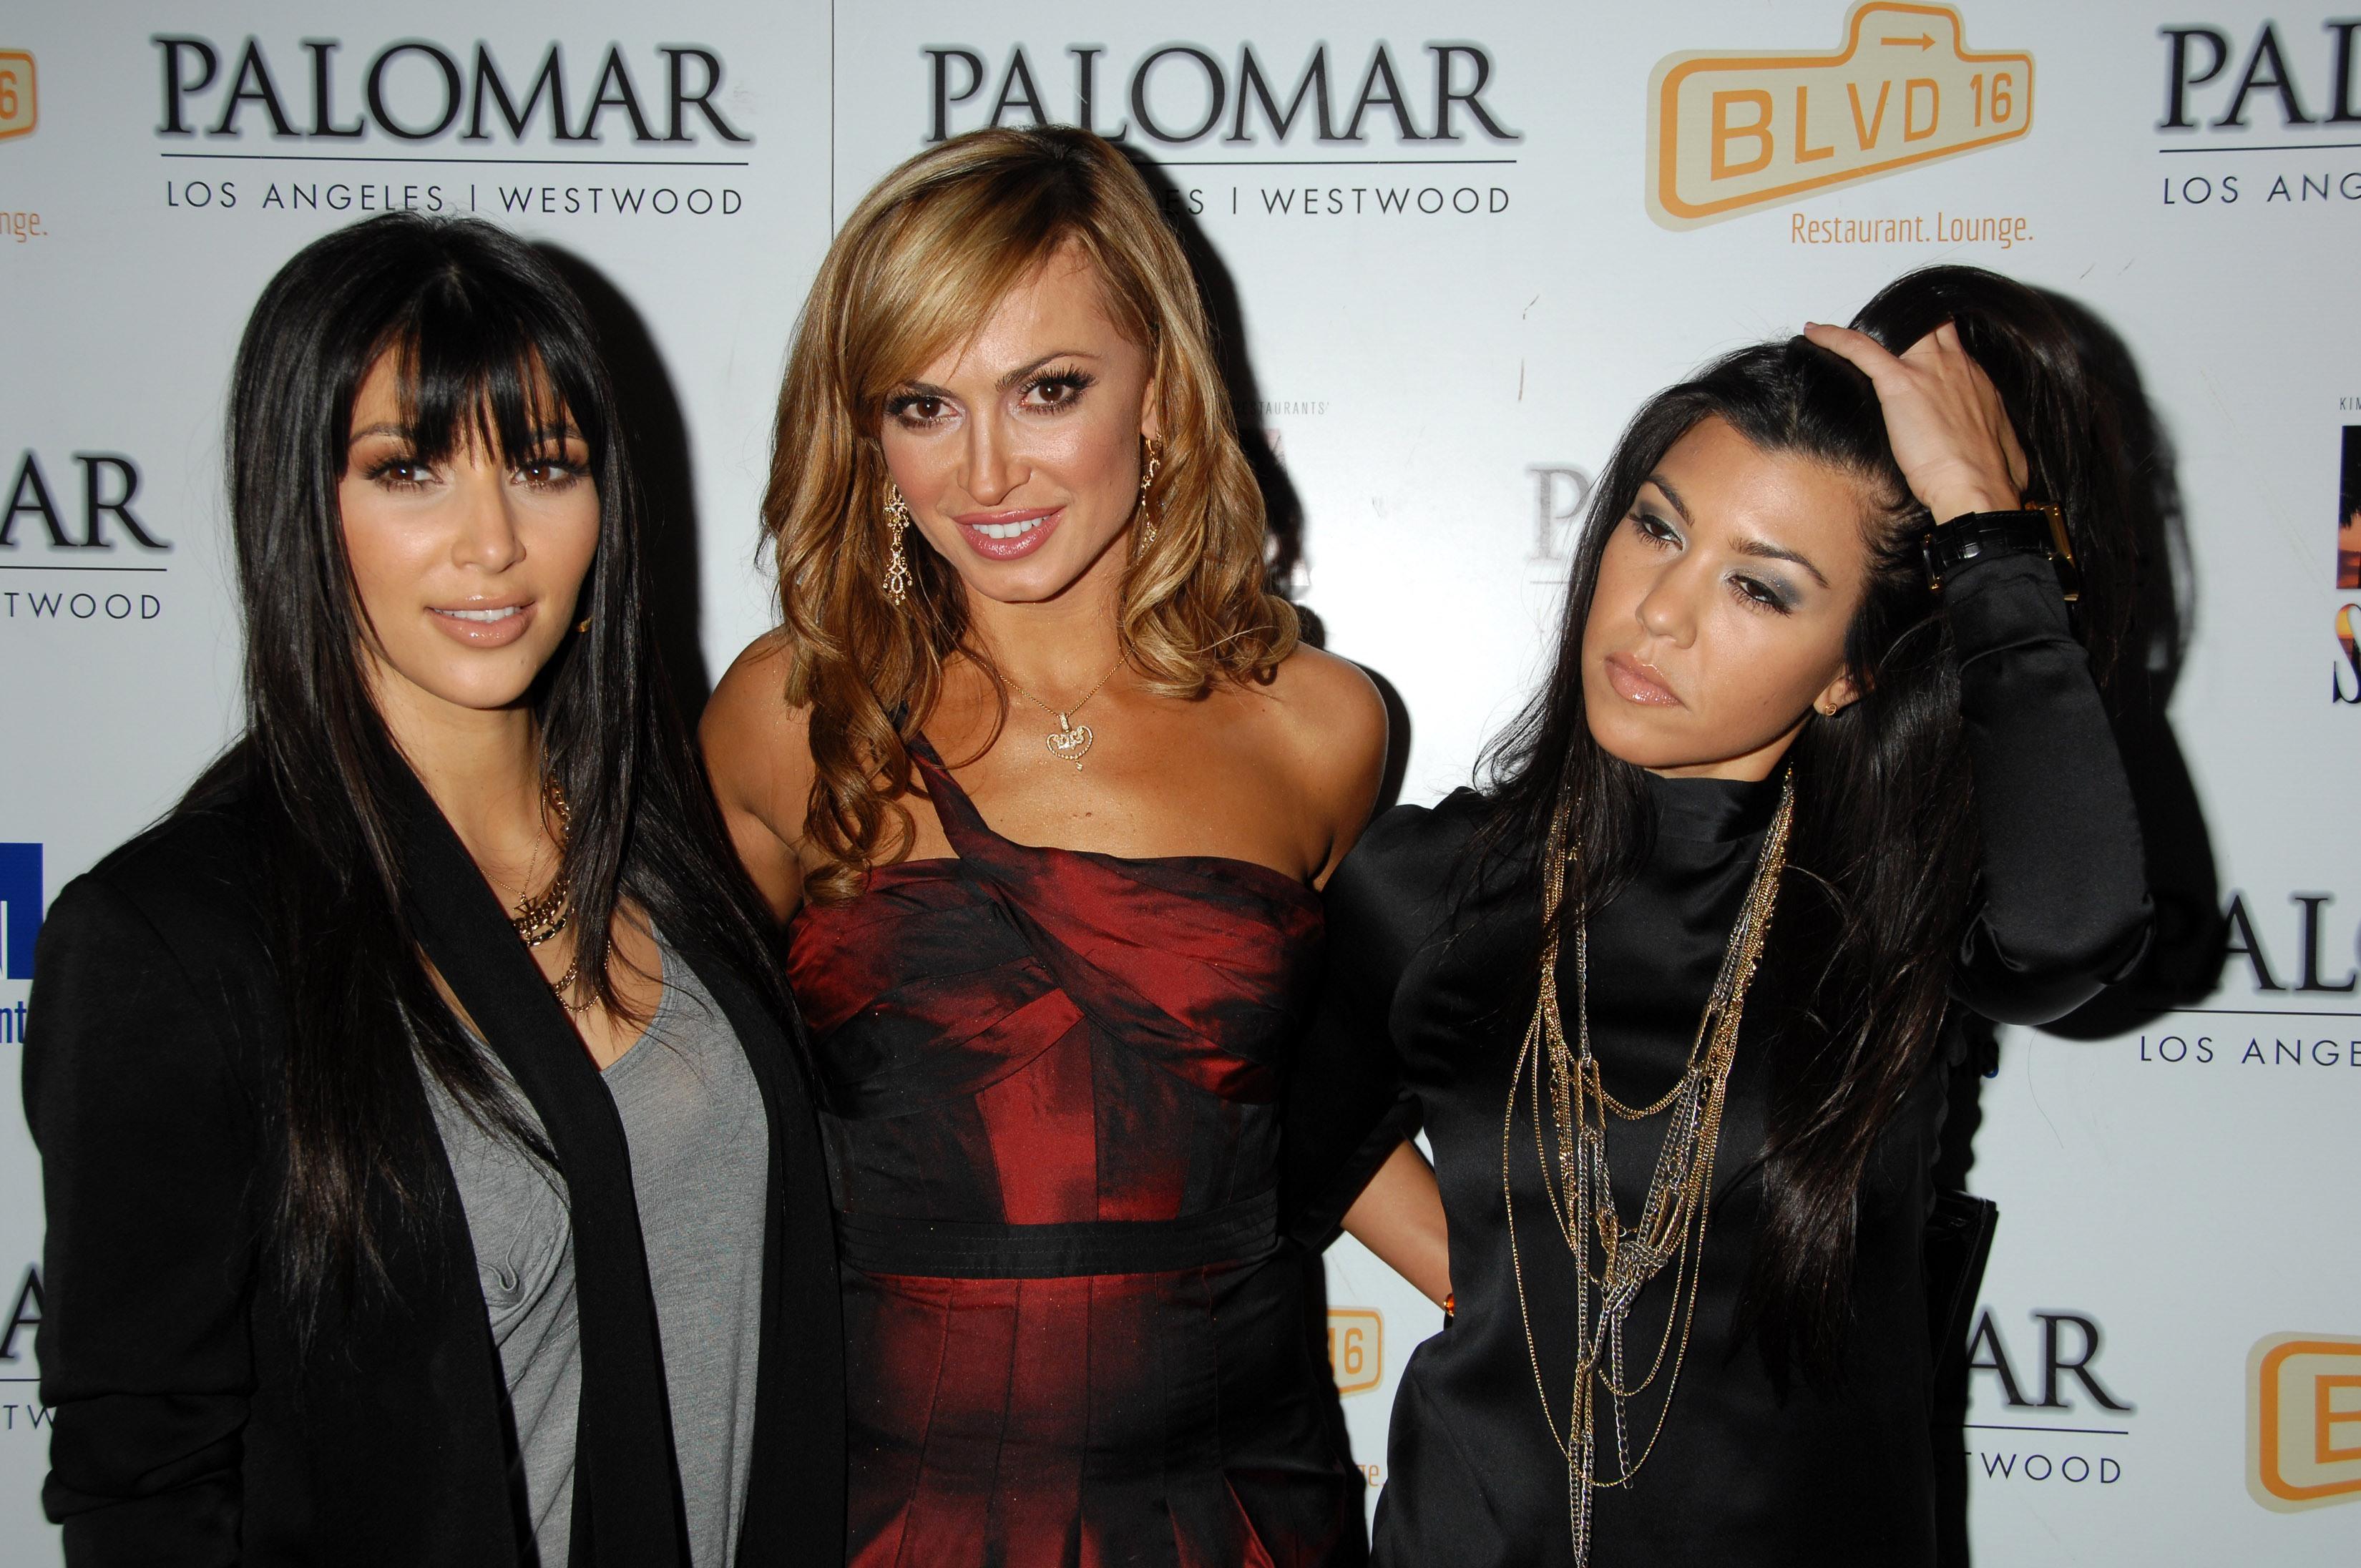 03301_Kim_Kardashian_2008-12-08_-_A_Night_For_Change_benefiting_Alternative_Intervention_Models_in_LA_335_122_181lo.jpg